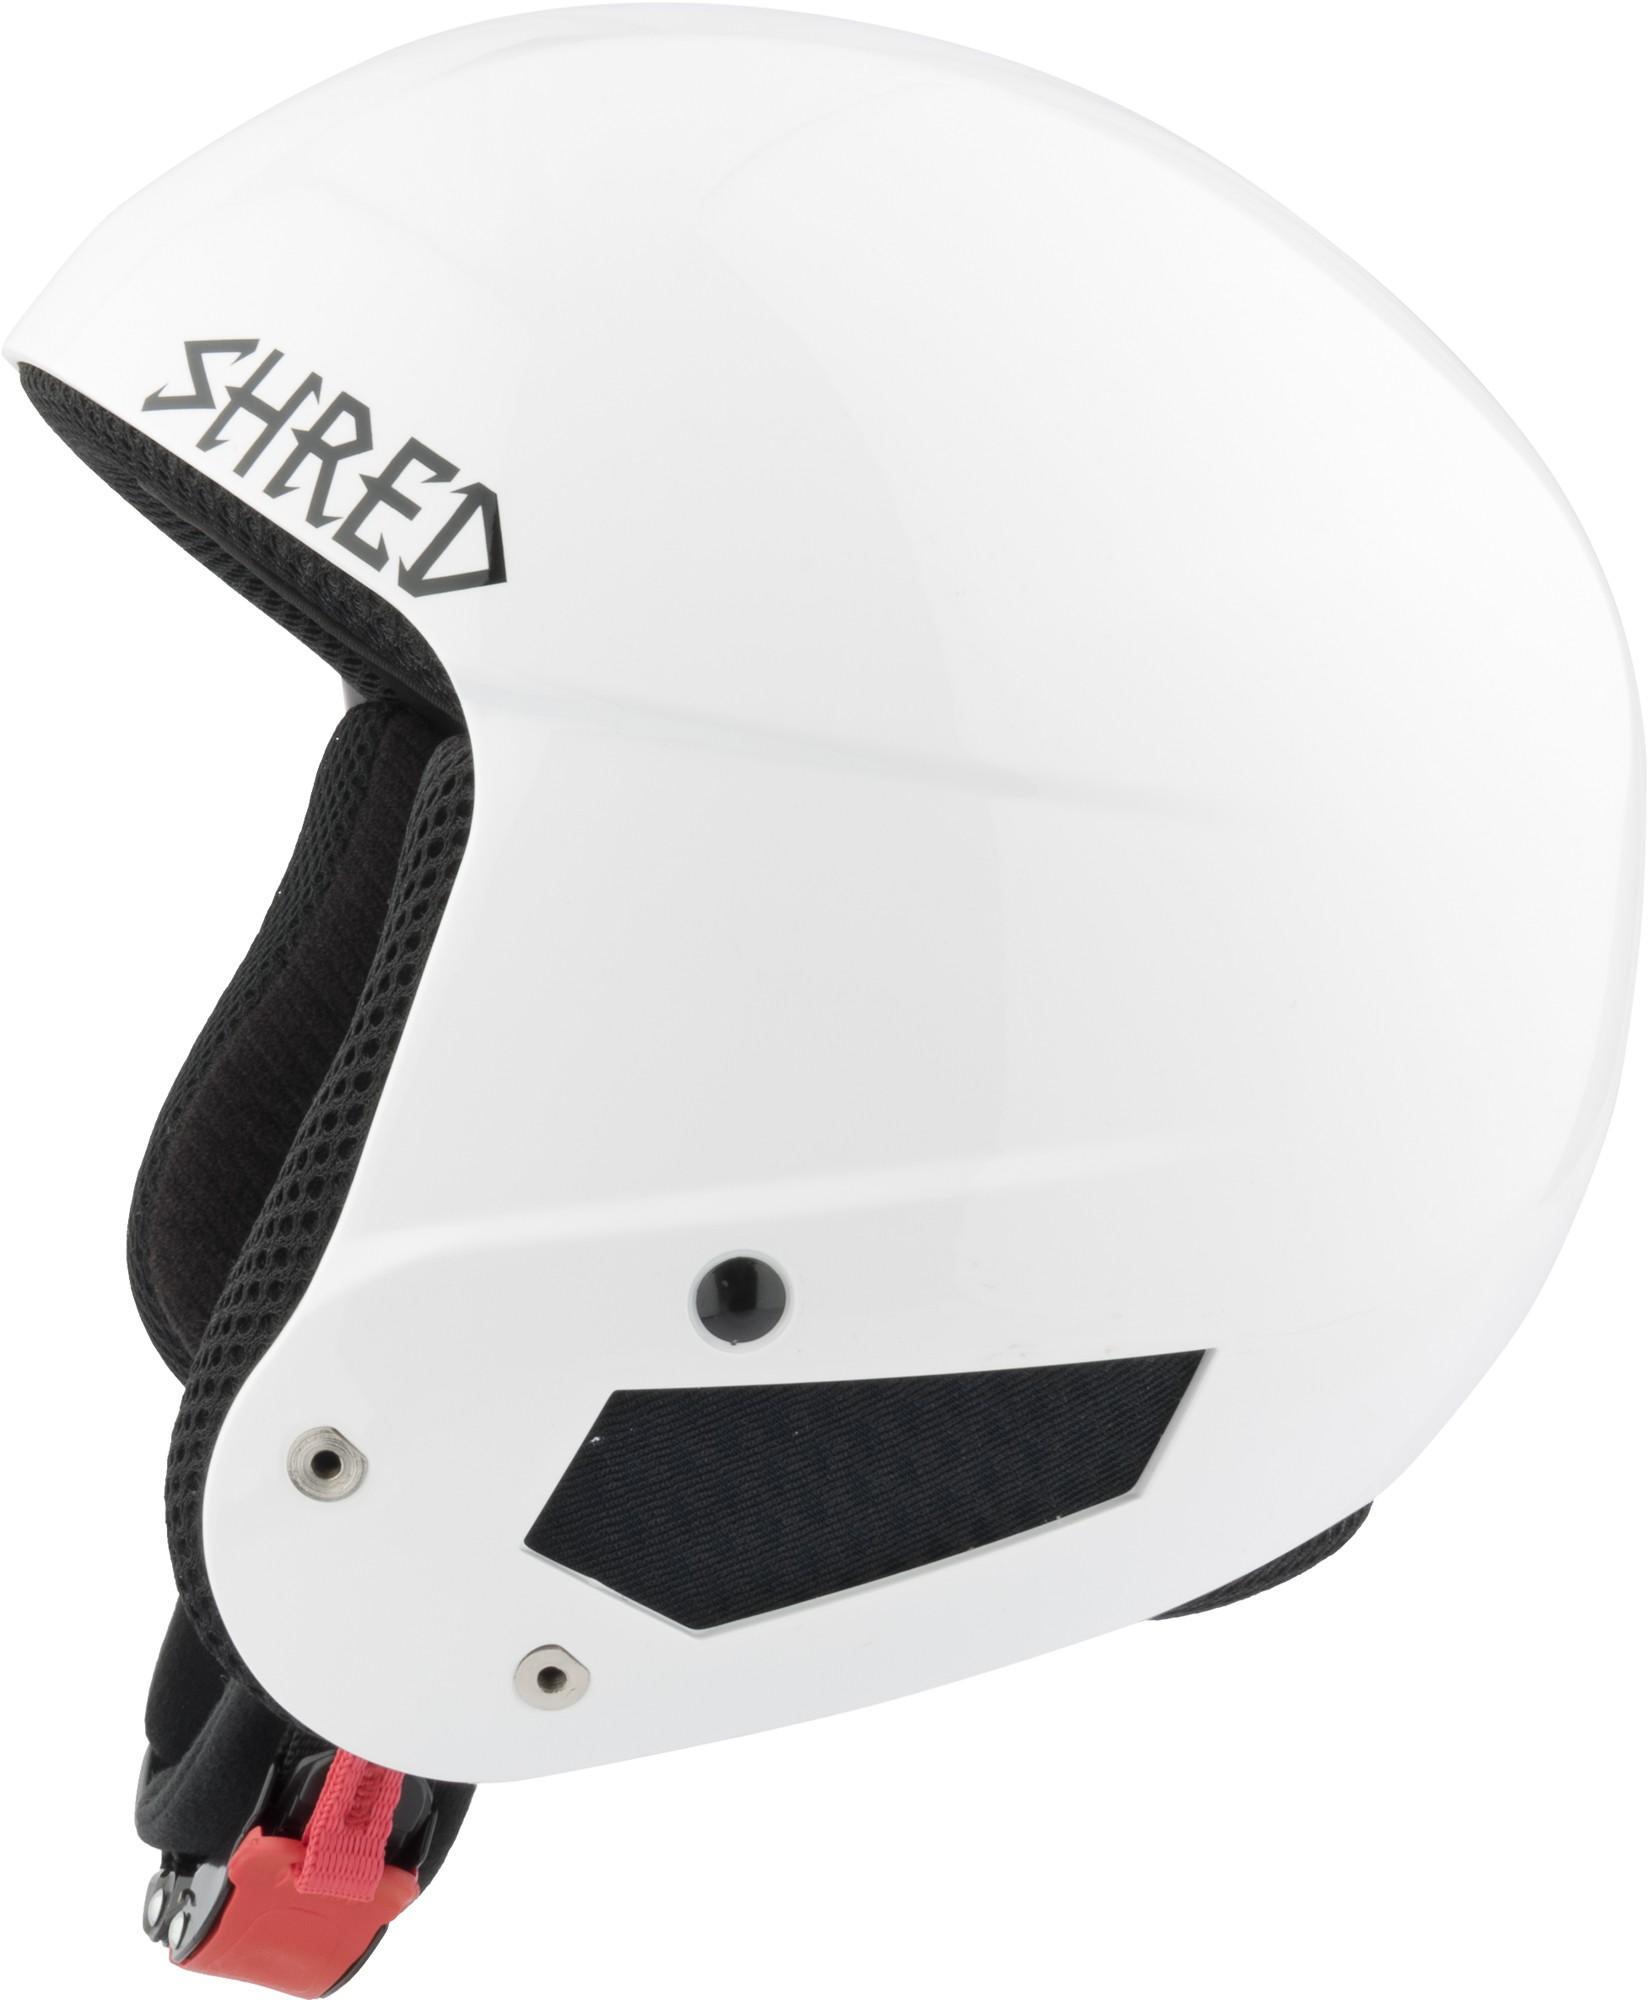 Shred Mega Brain Bucket RH FIS WIPEOUT ski helmet, 2017